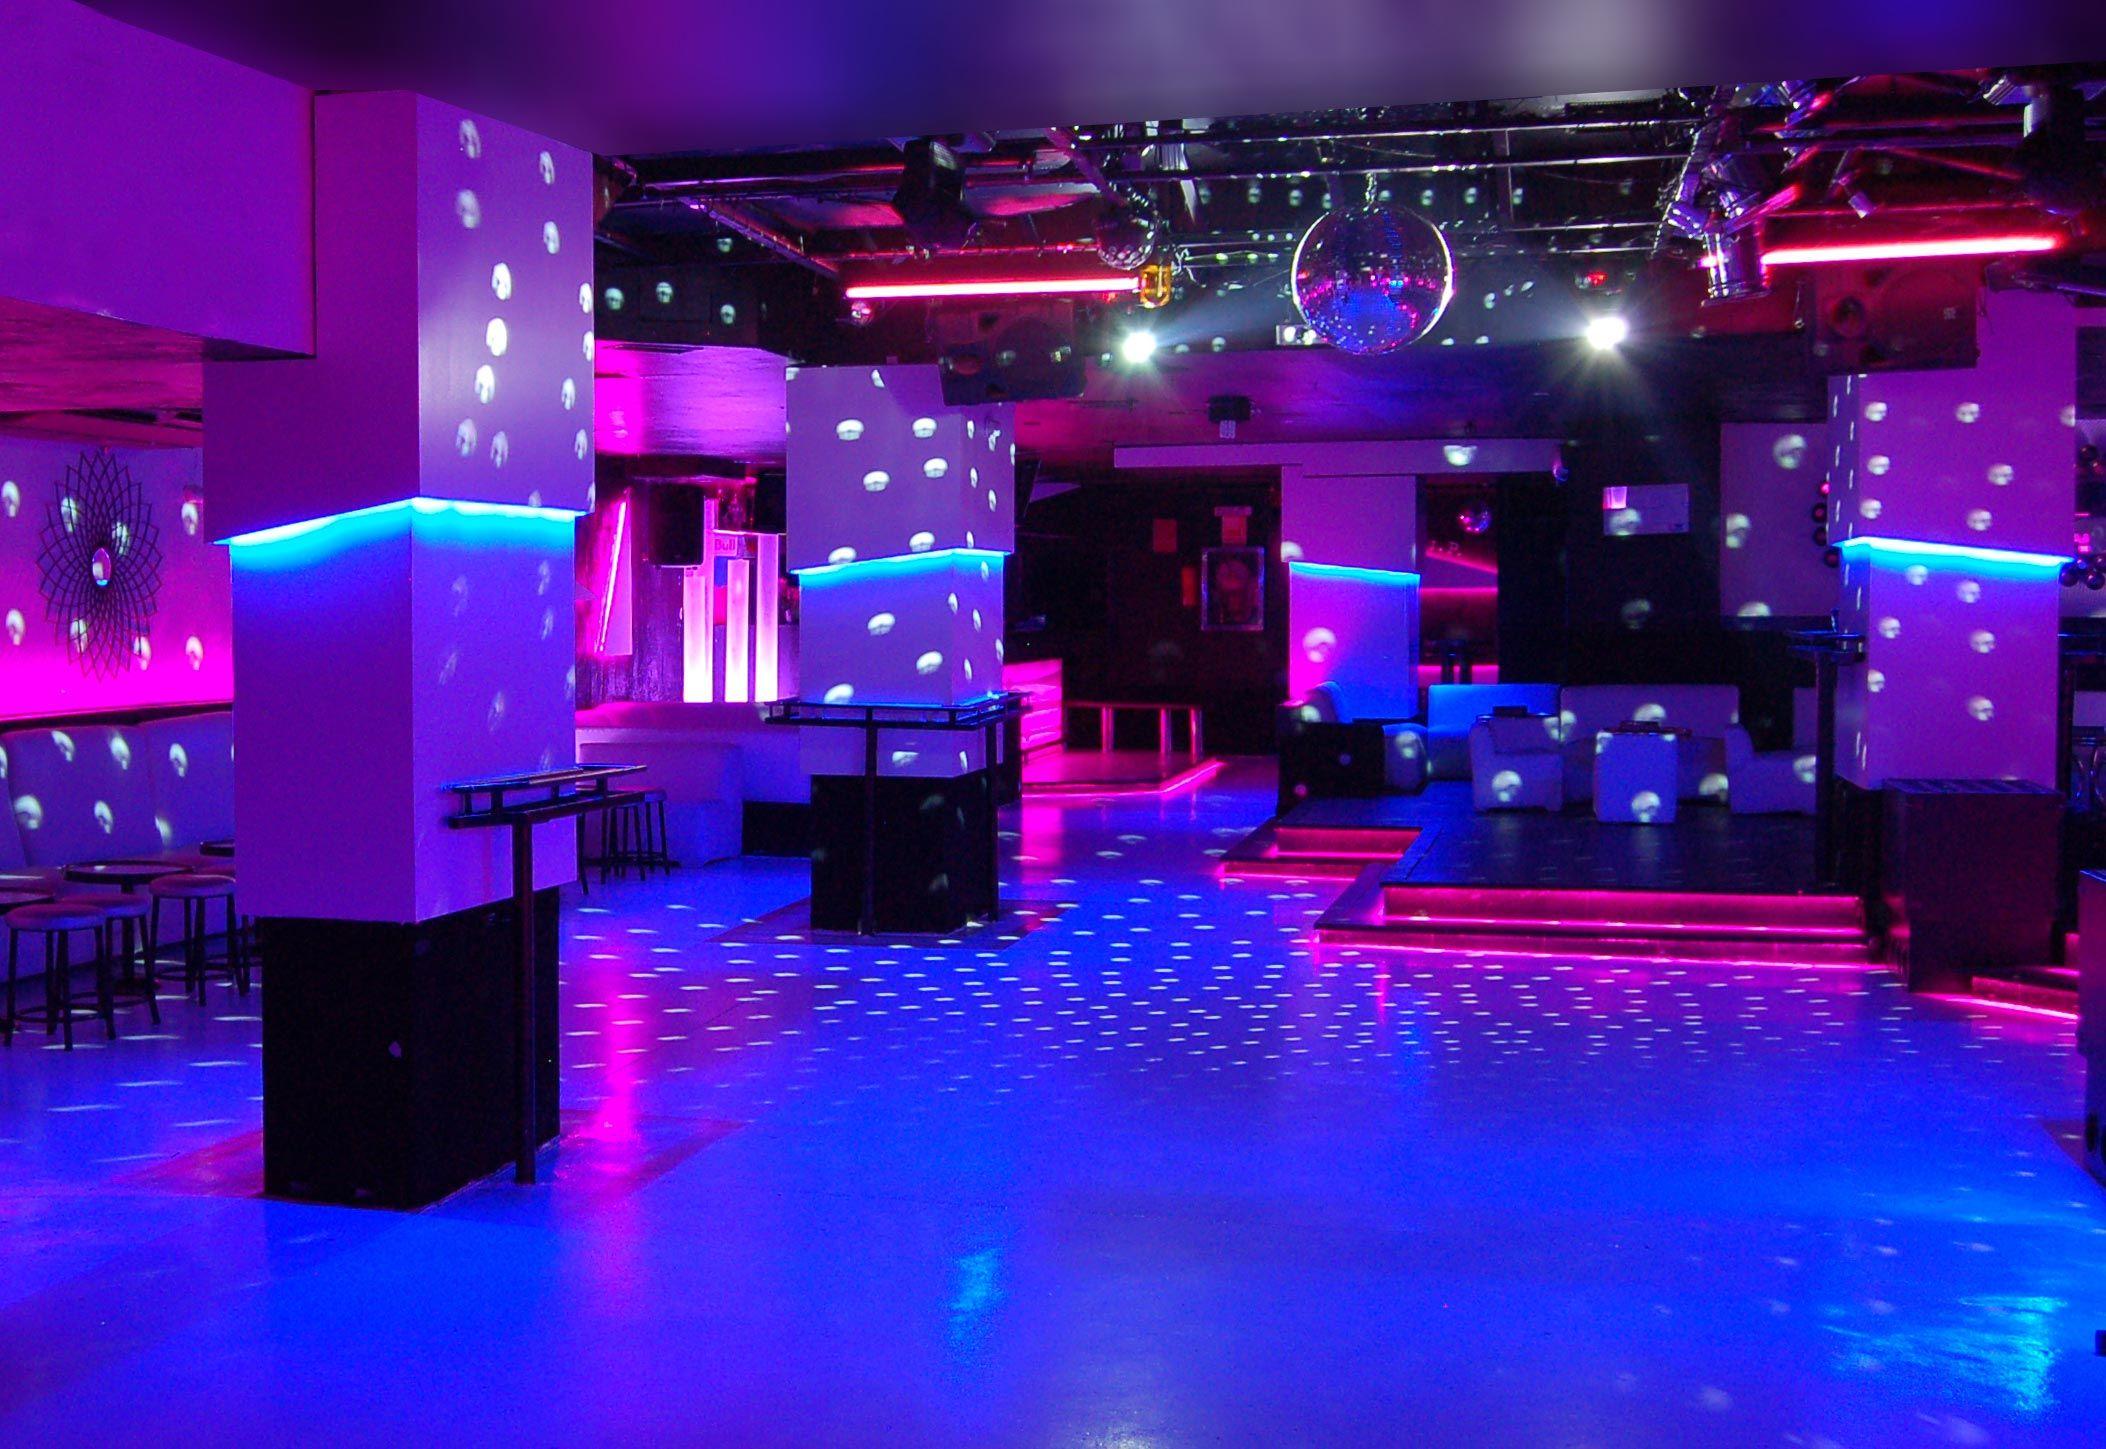 Discoteca Ozona Vip : bar-disco : Pinterest : Interiores, Noche y ...